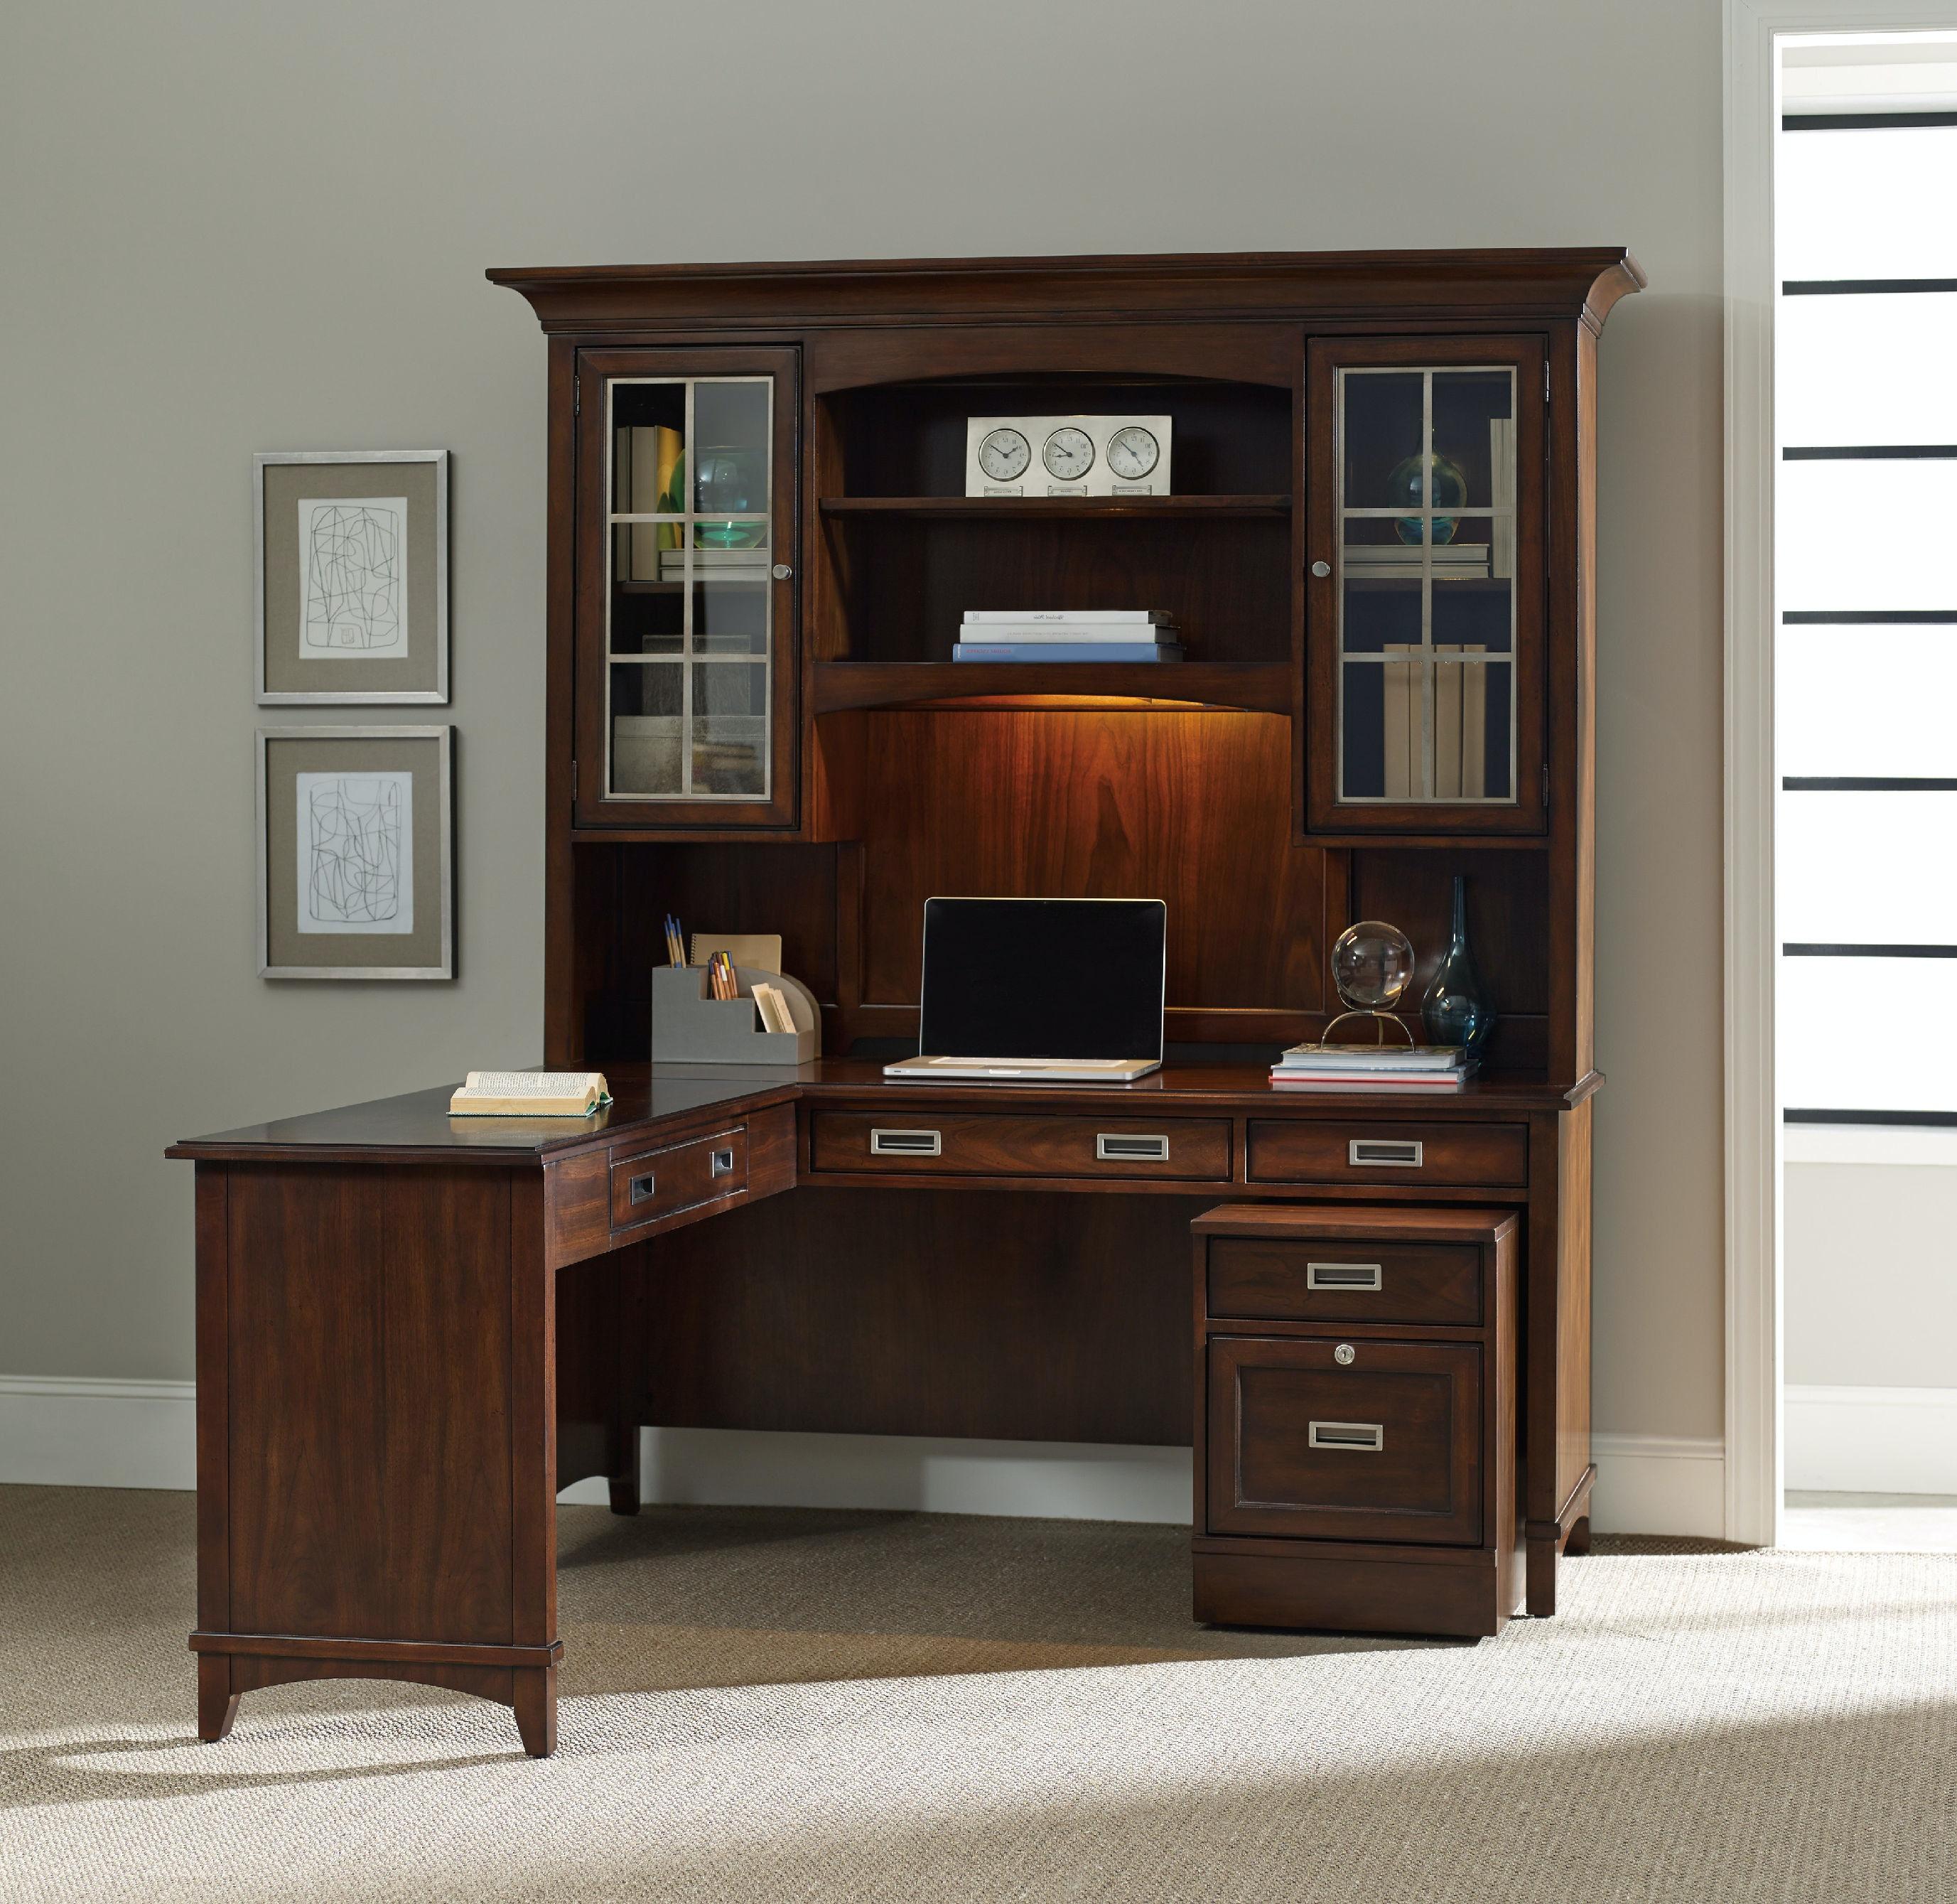 hooker furniture home office latitude computer credenza/desk hutch